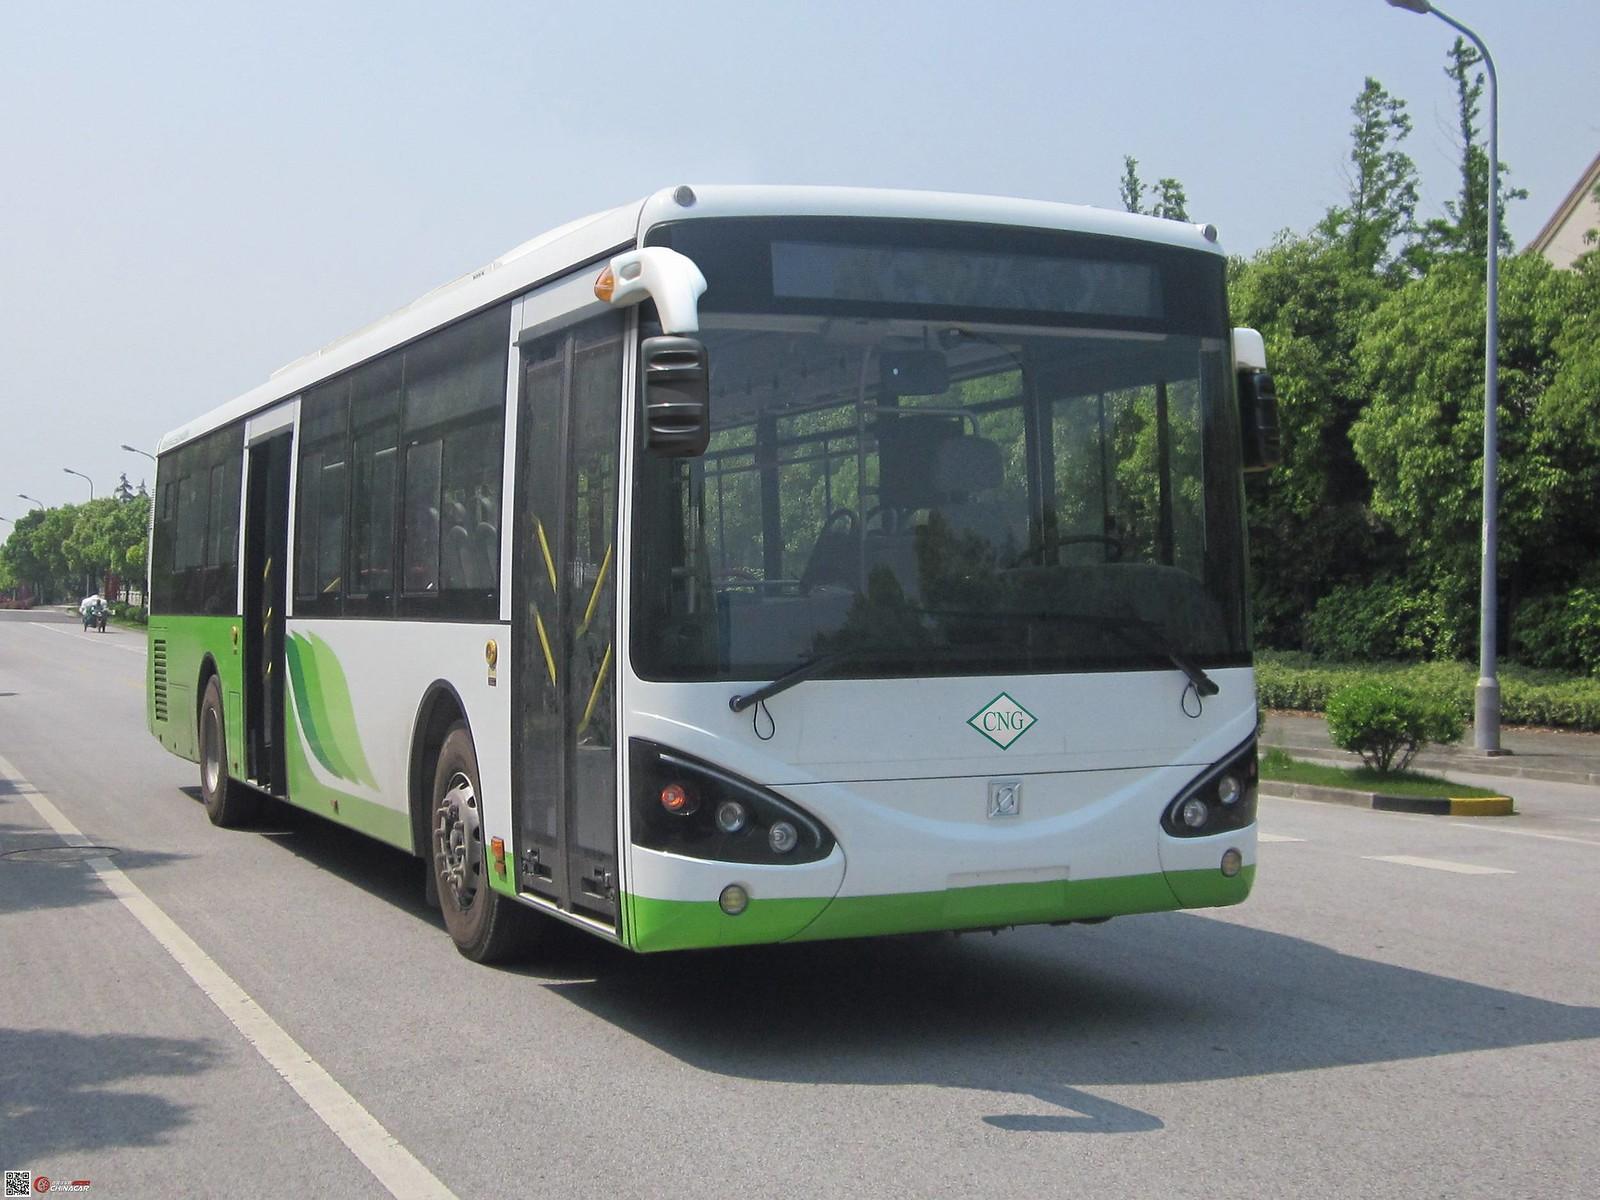 [wip]青岛巴士涂装(上海申沃) for solaris urbino 12